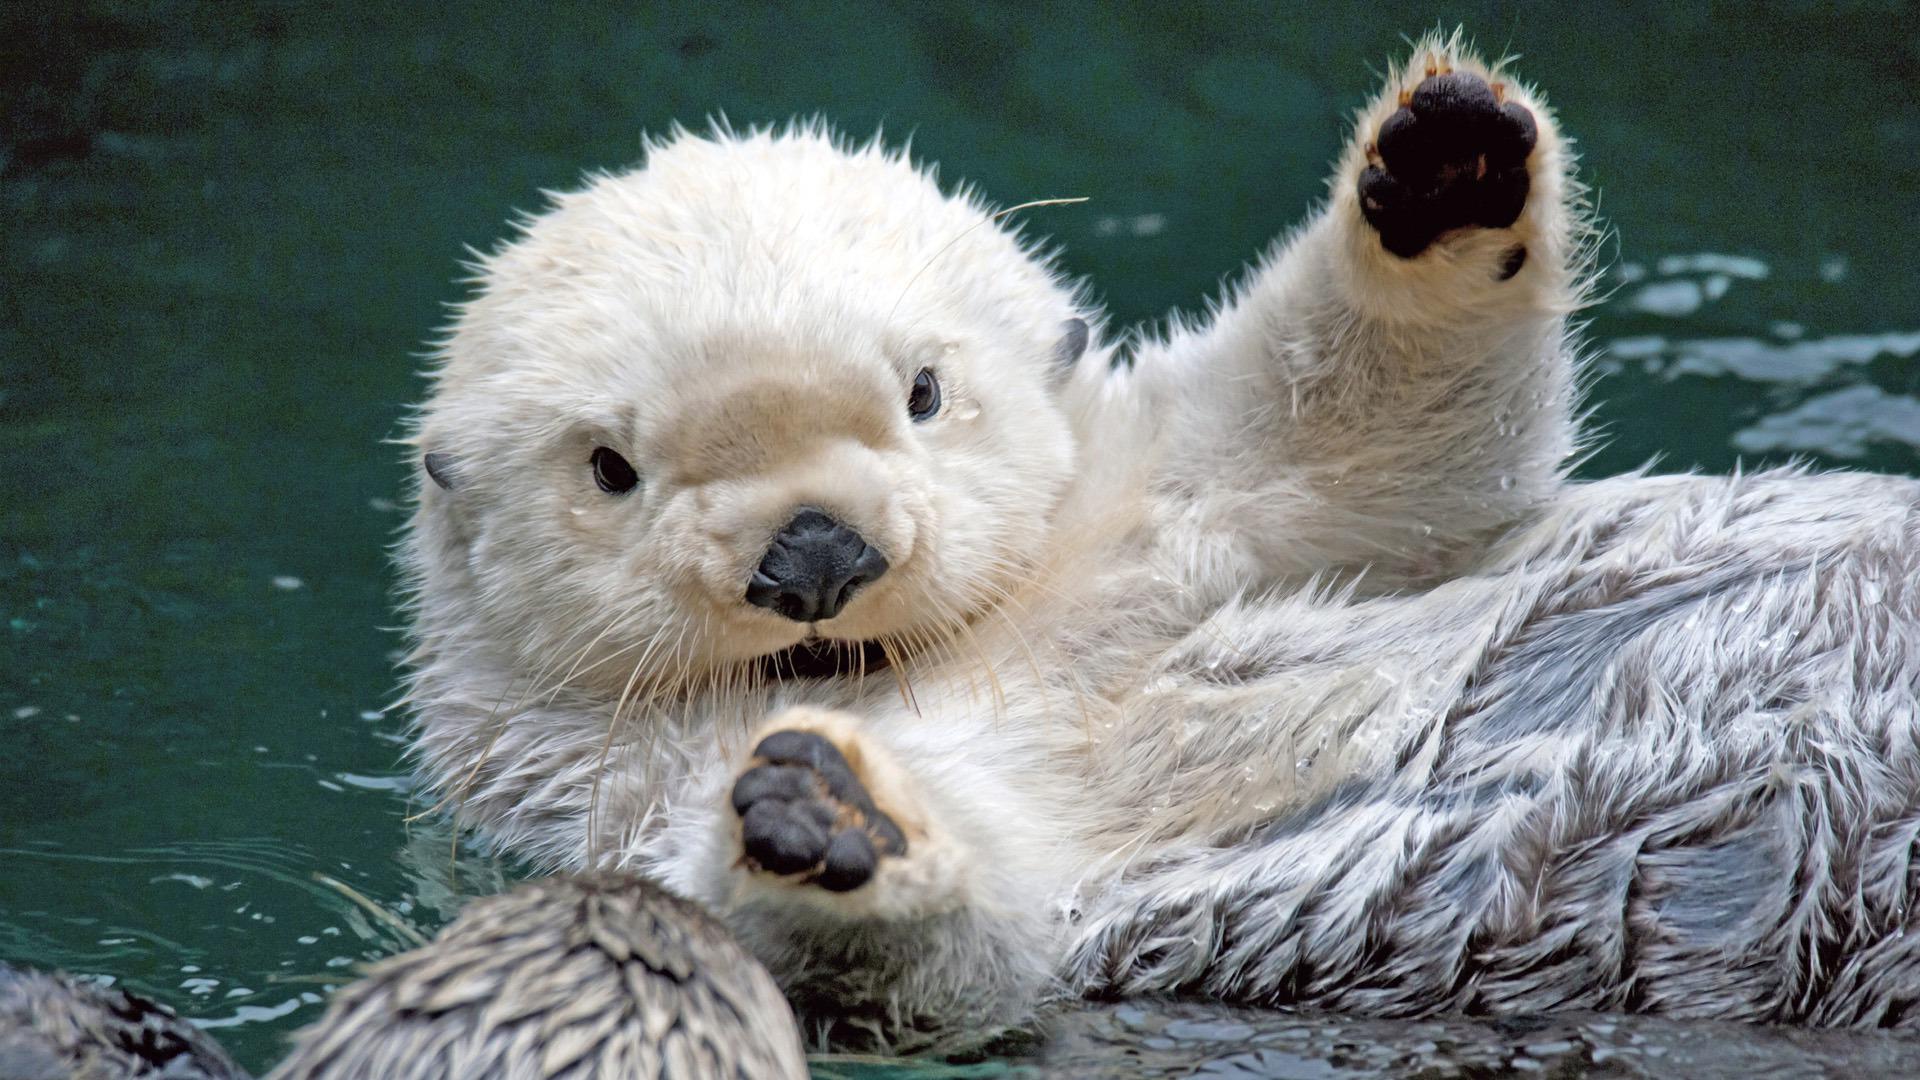 sea otter animal cute wallpaper 1920x1080